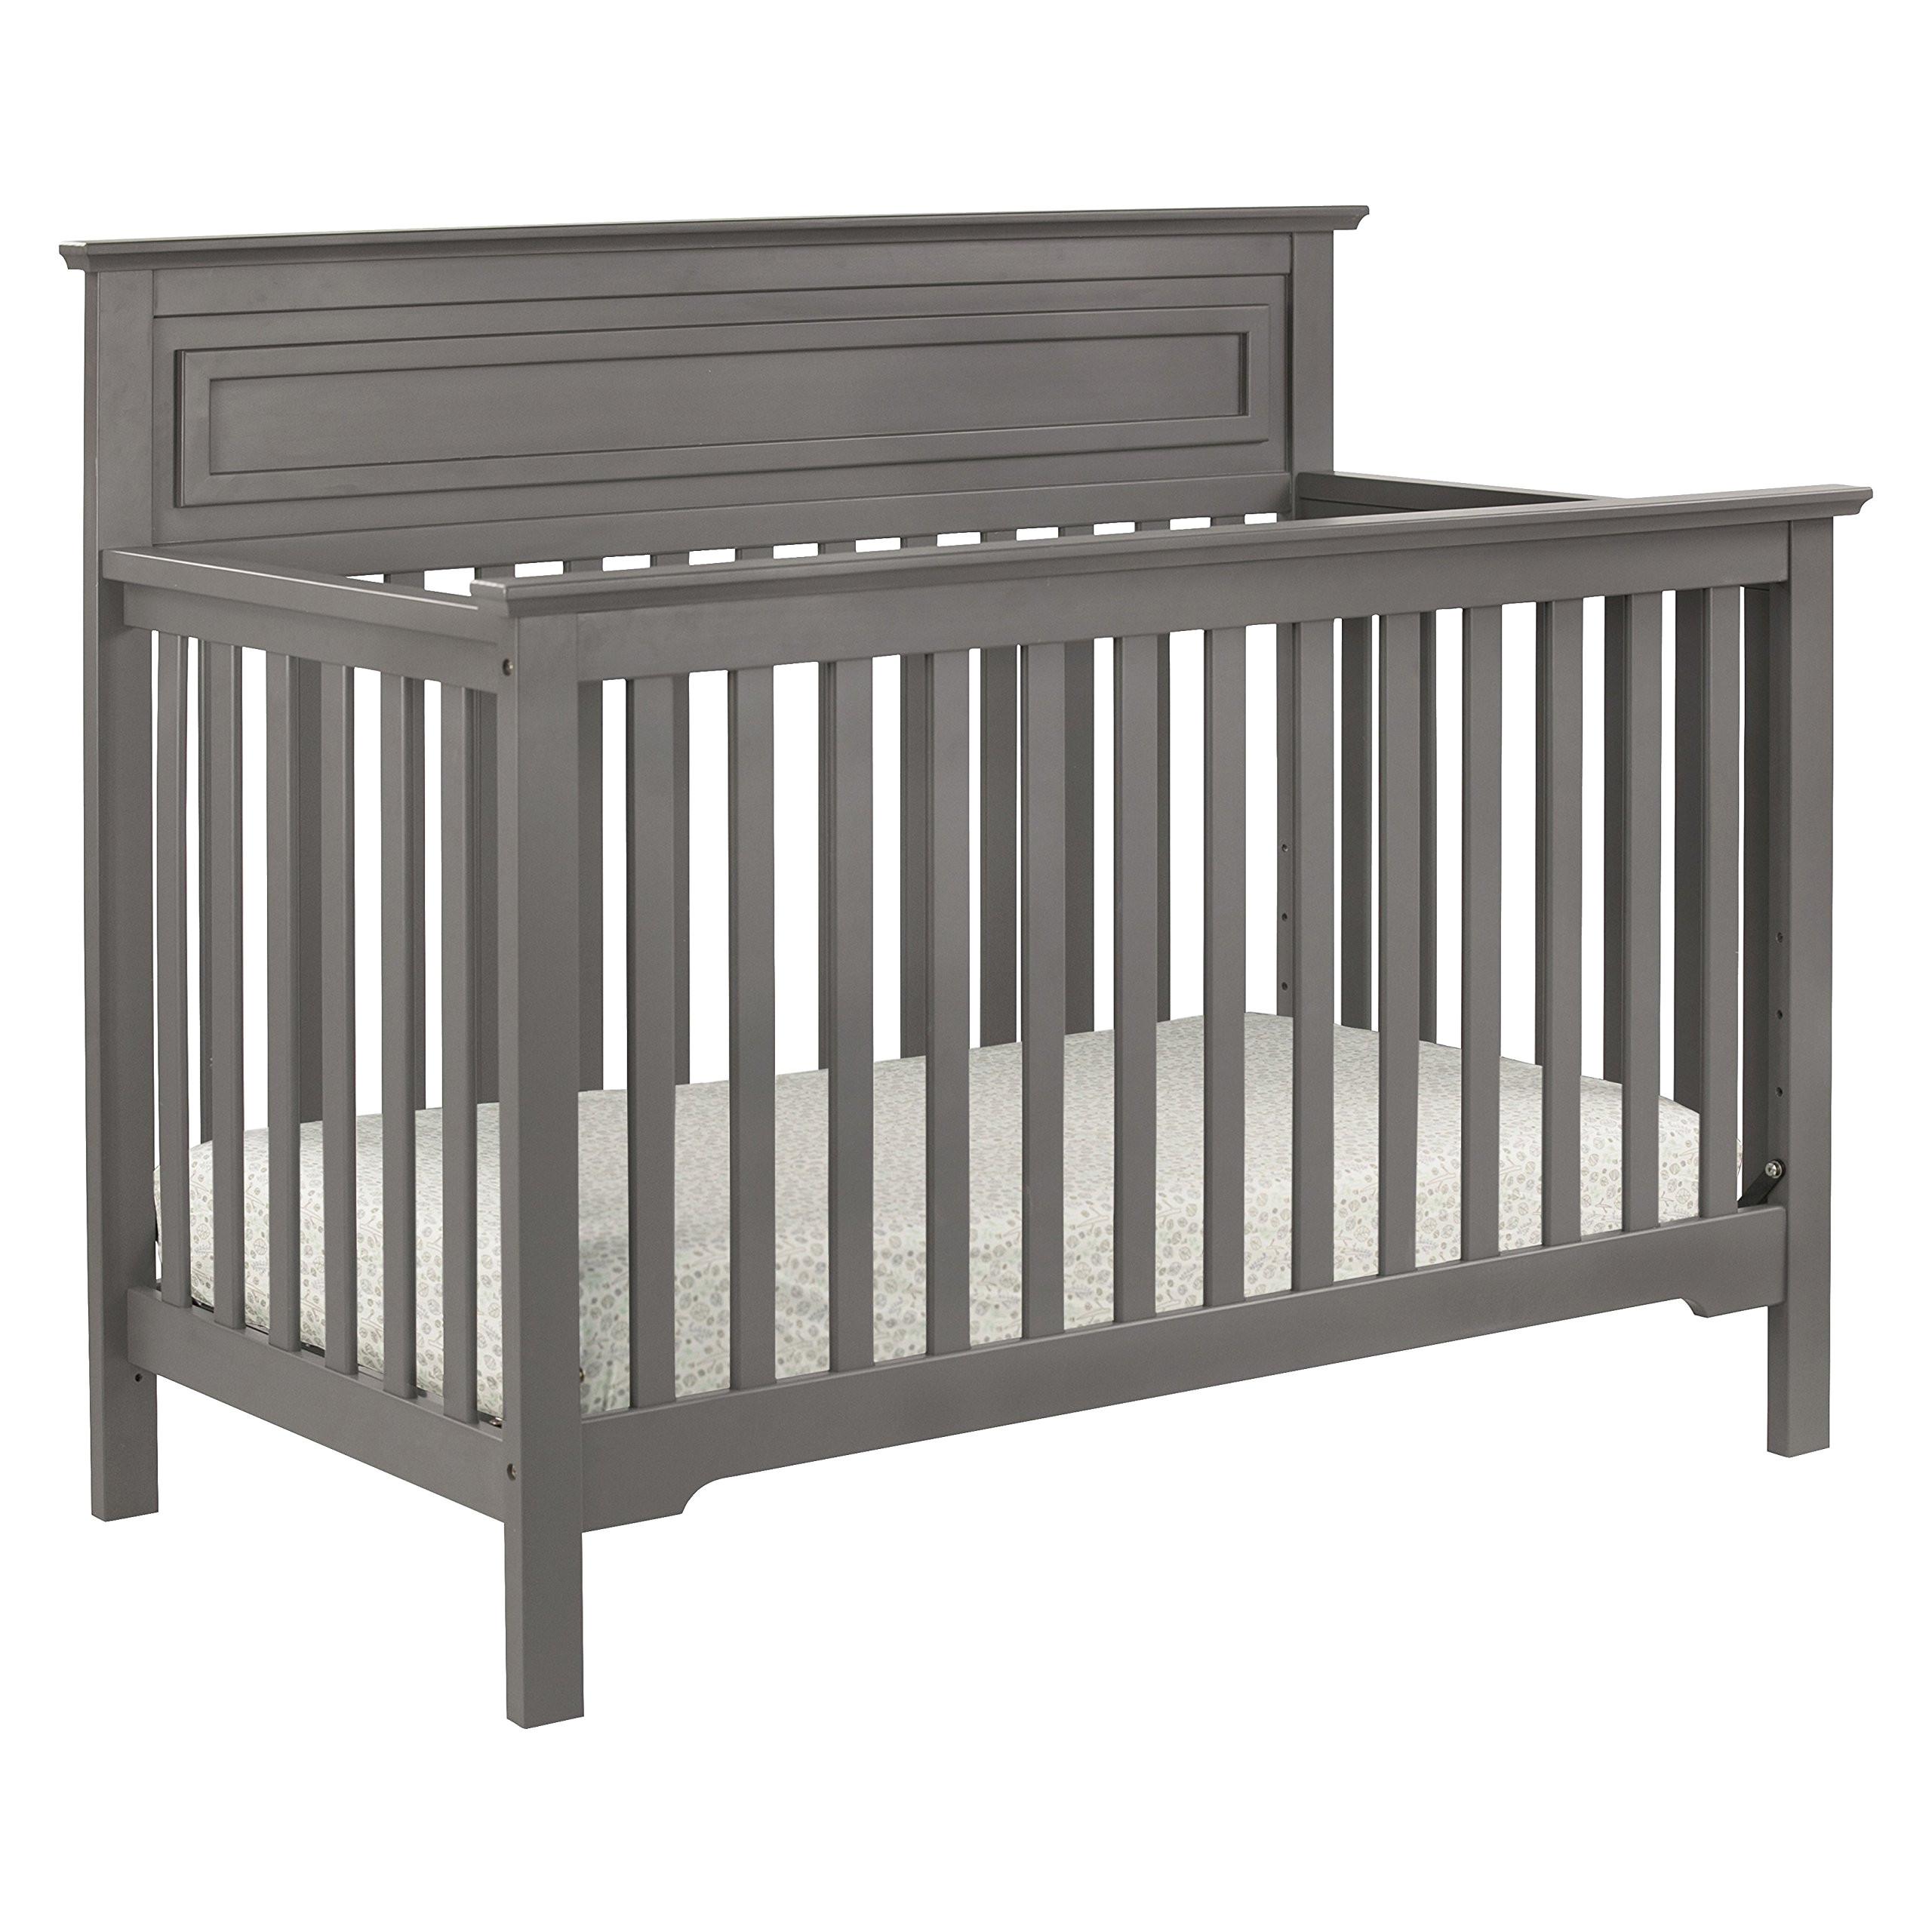 Crib and Changing Table Combo Buy Buy Baby Amazon Com Davinci Autumn 4 In 1 Convertible Crib Slate Baby